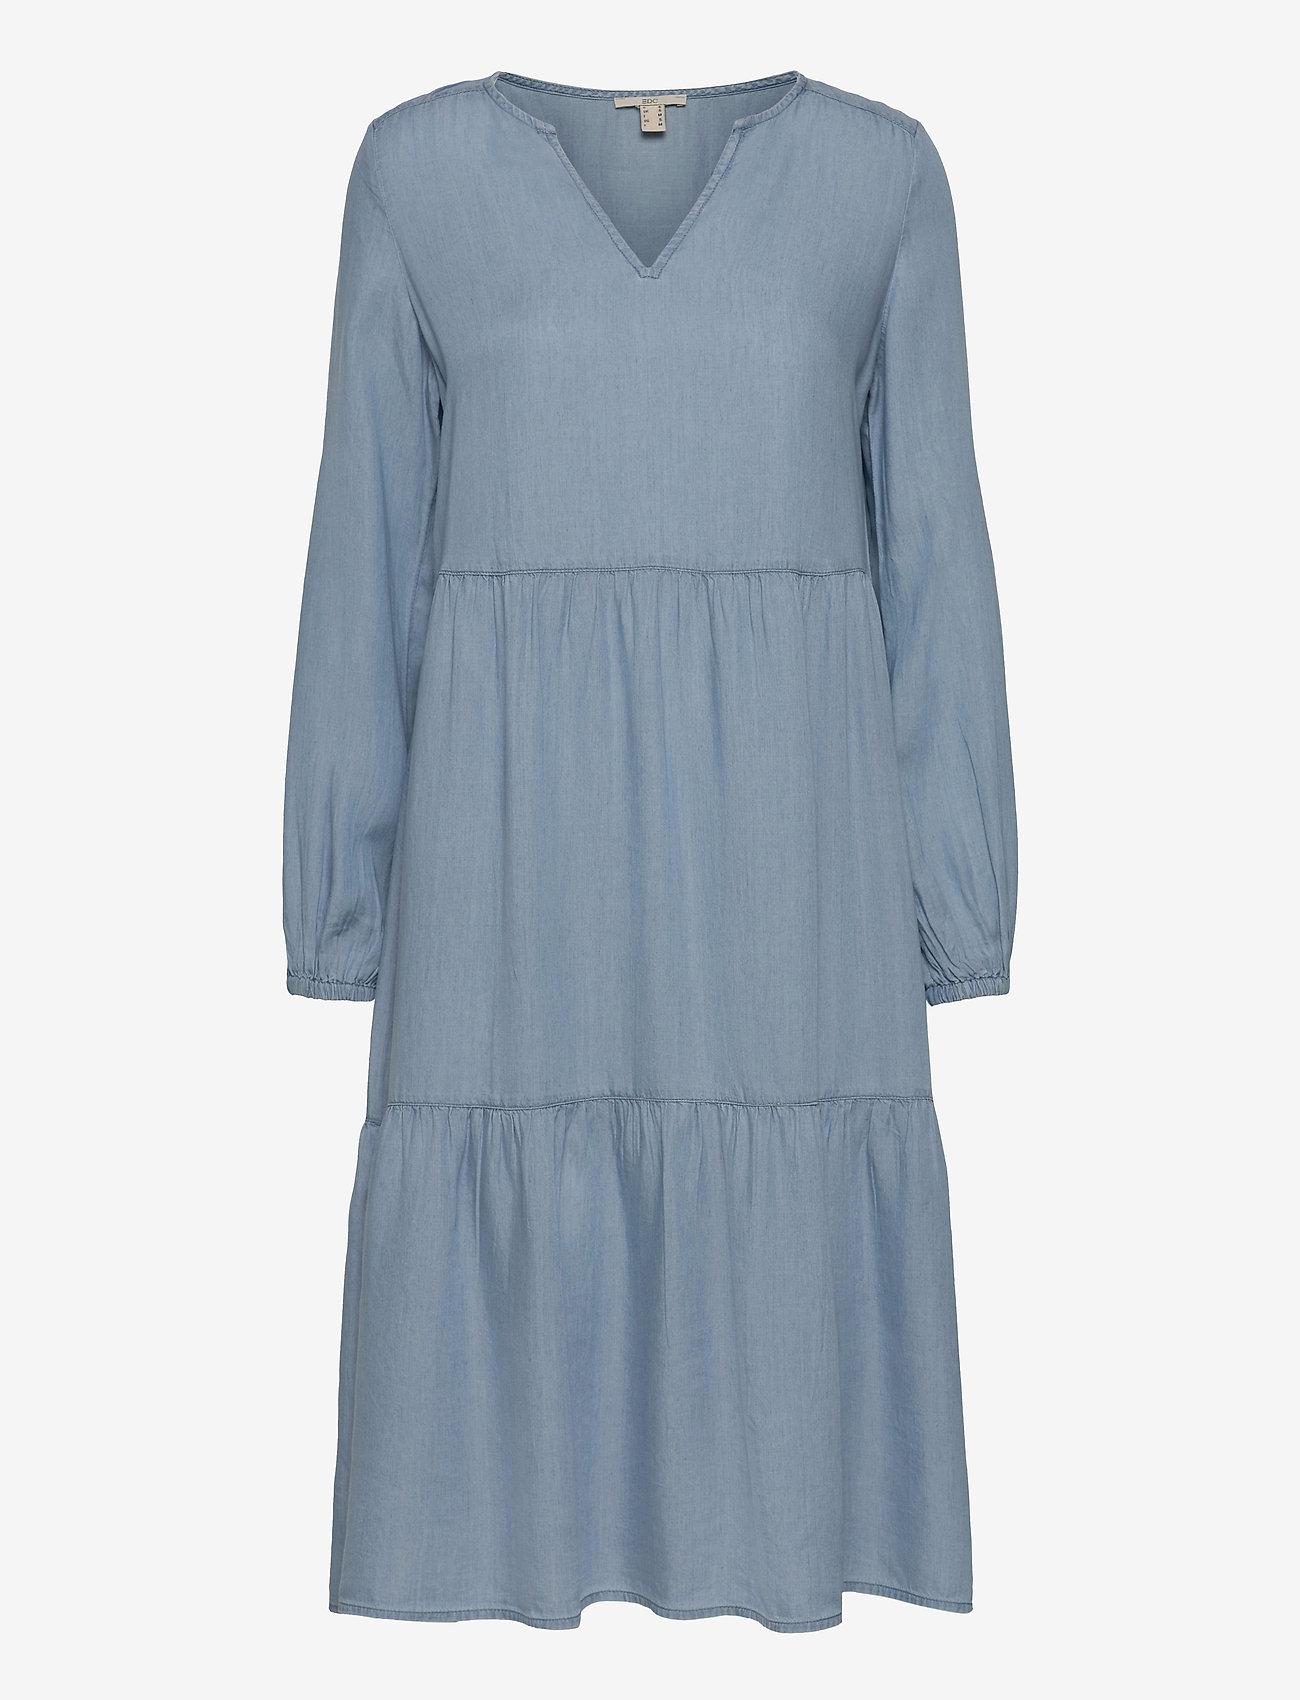 EDC by Esprit - Dresses denim - midi dresses - blue light wash - 0